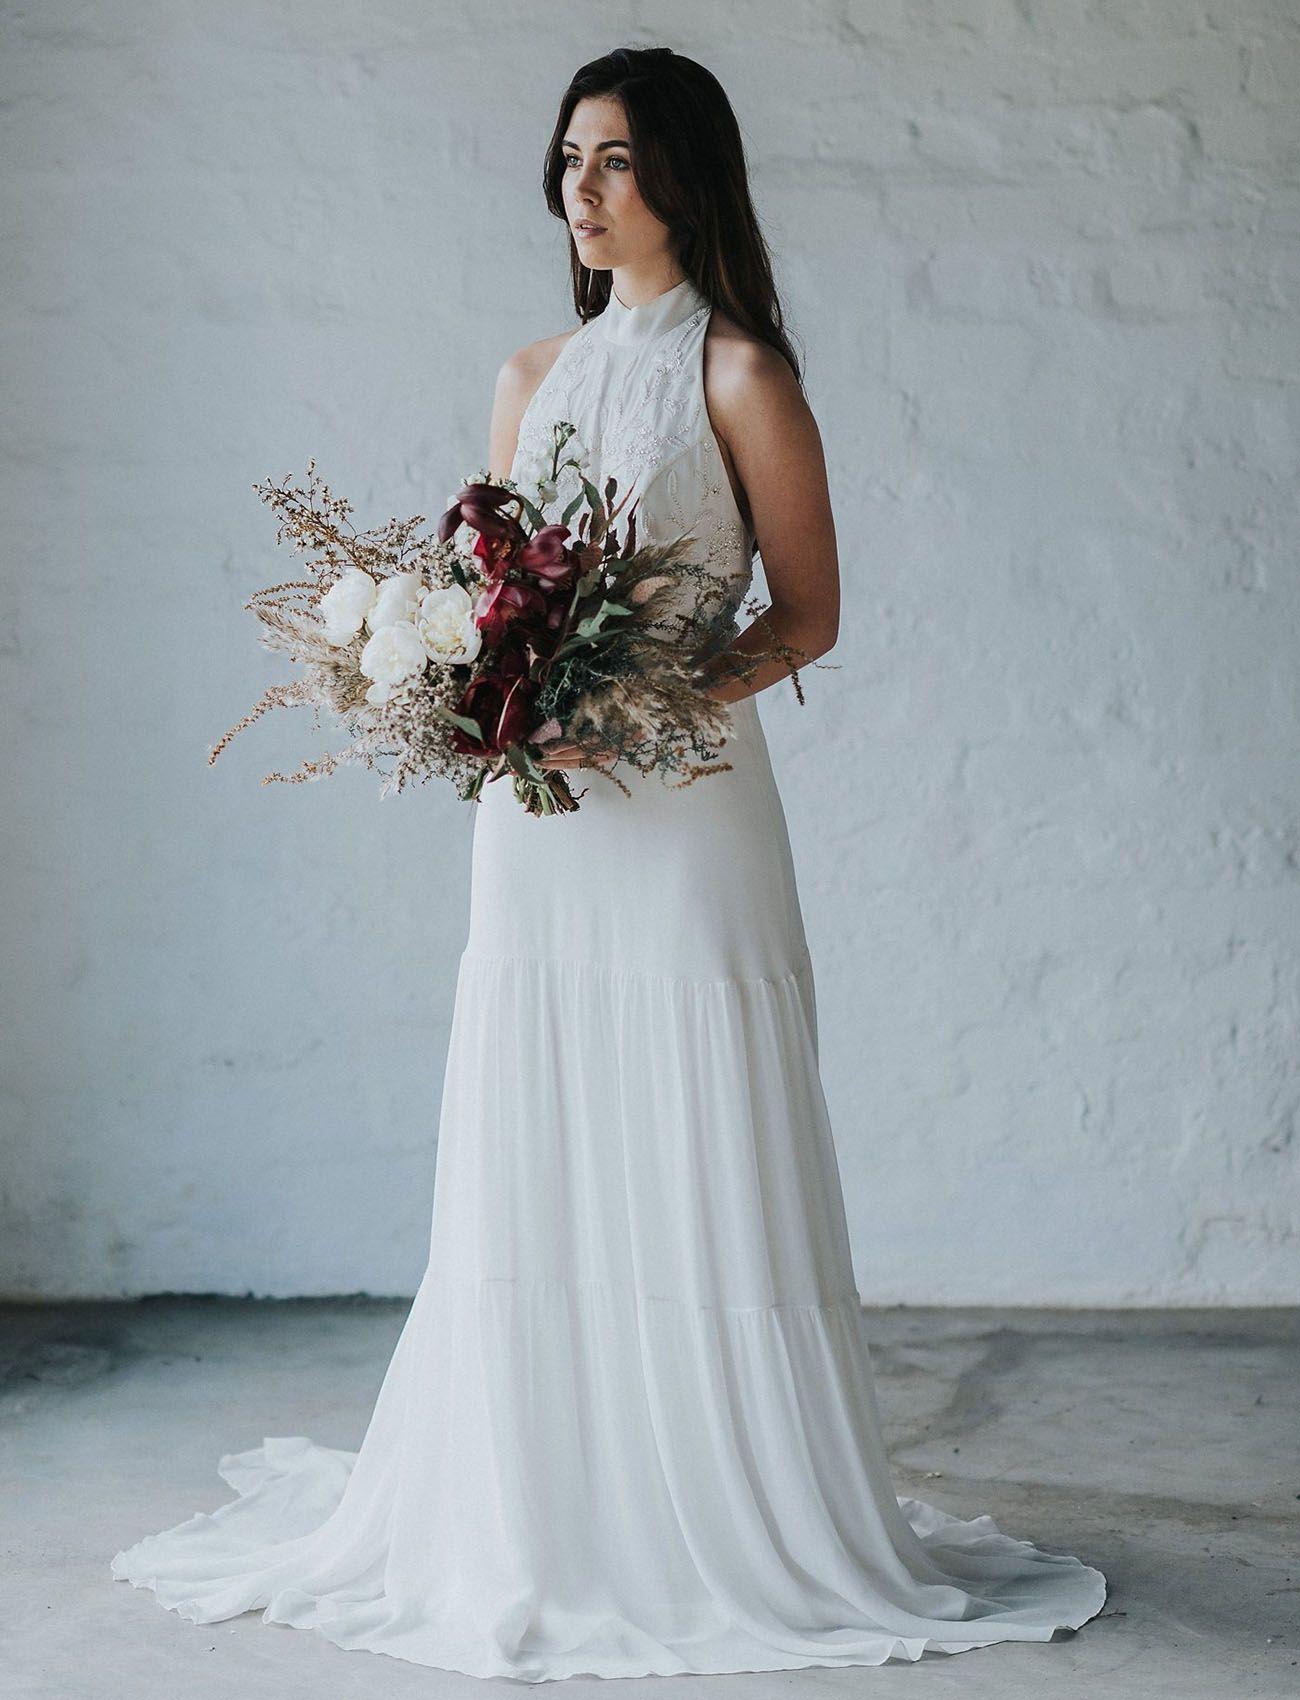 Wild Foliage Meets Watercolor Wedding Inspiration | Wedding dress ...